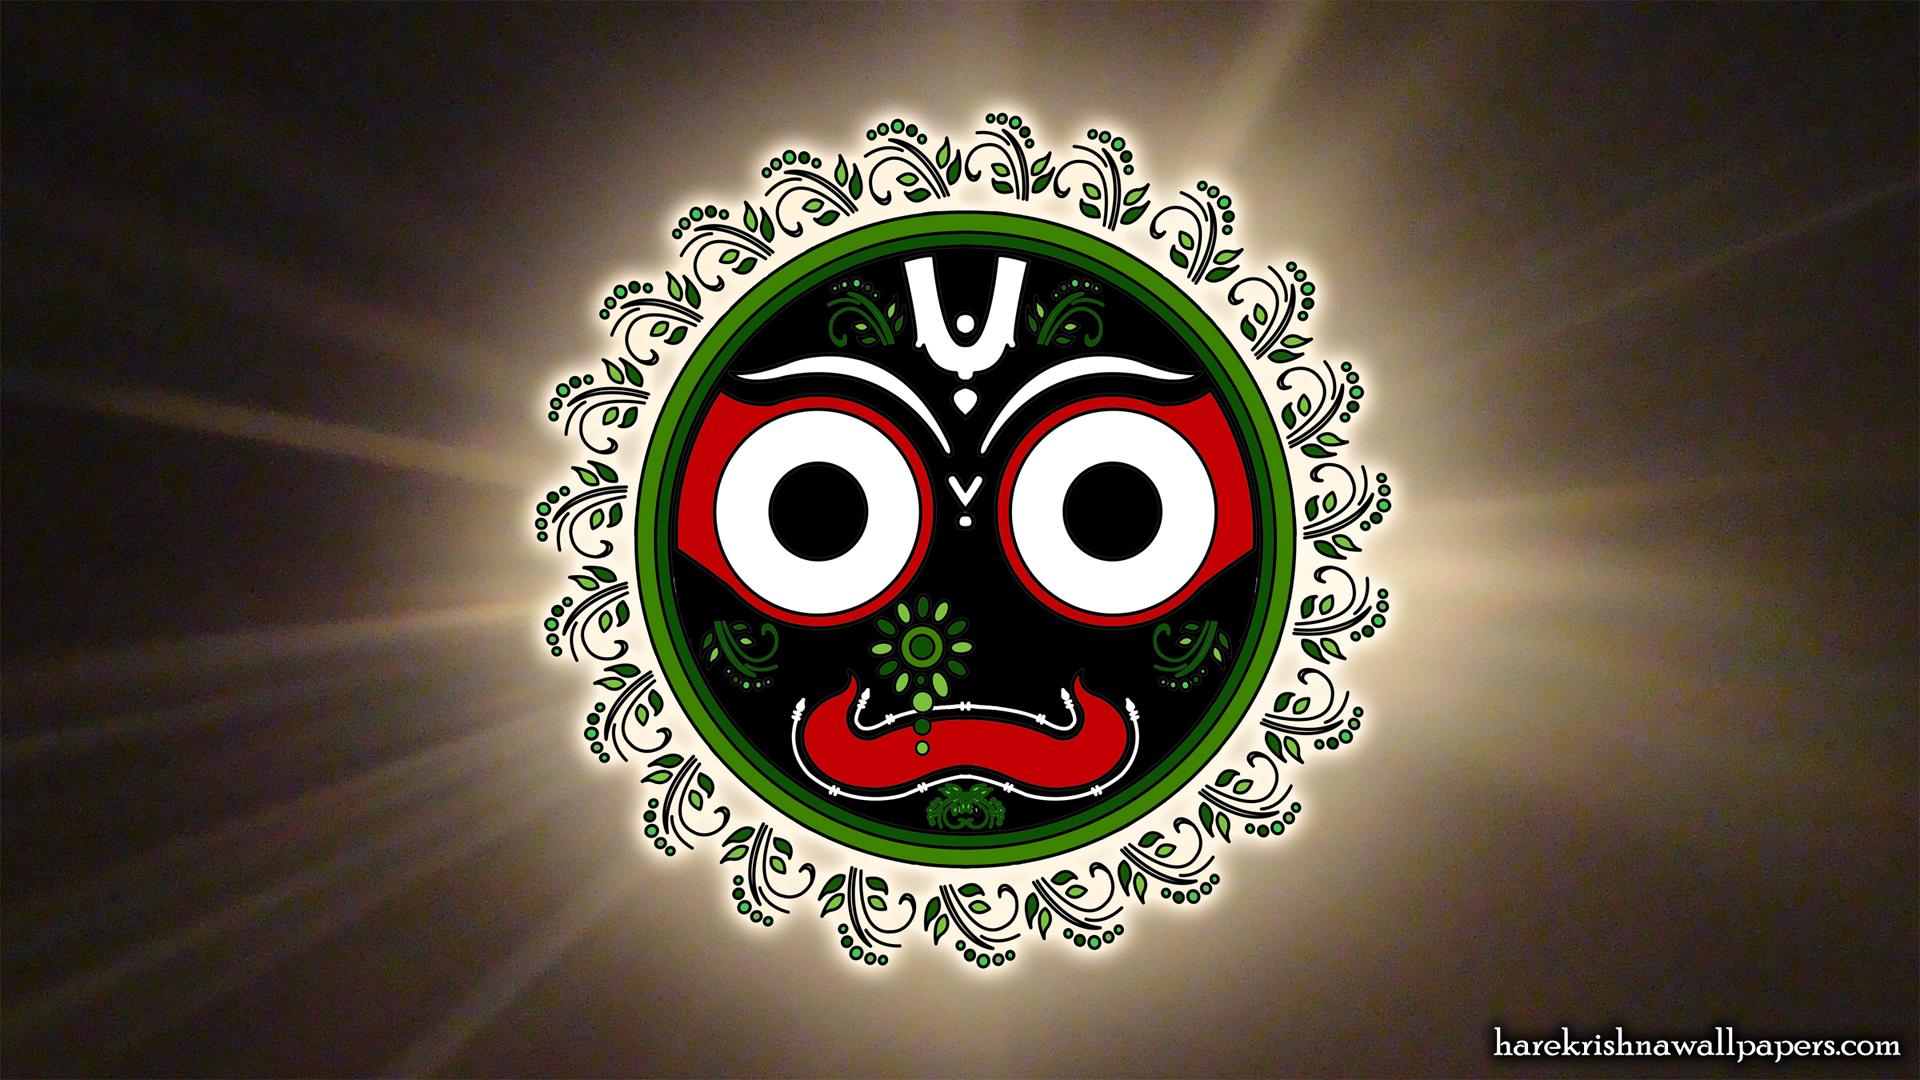 Jai Jagannath Wallpaper (030) Size 1920x1080 Download